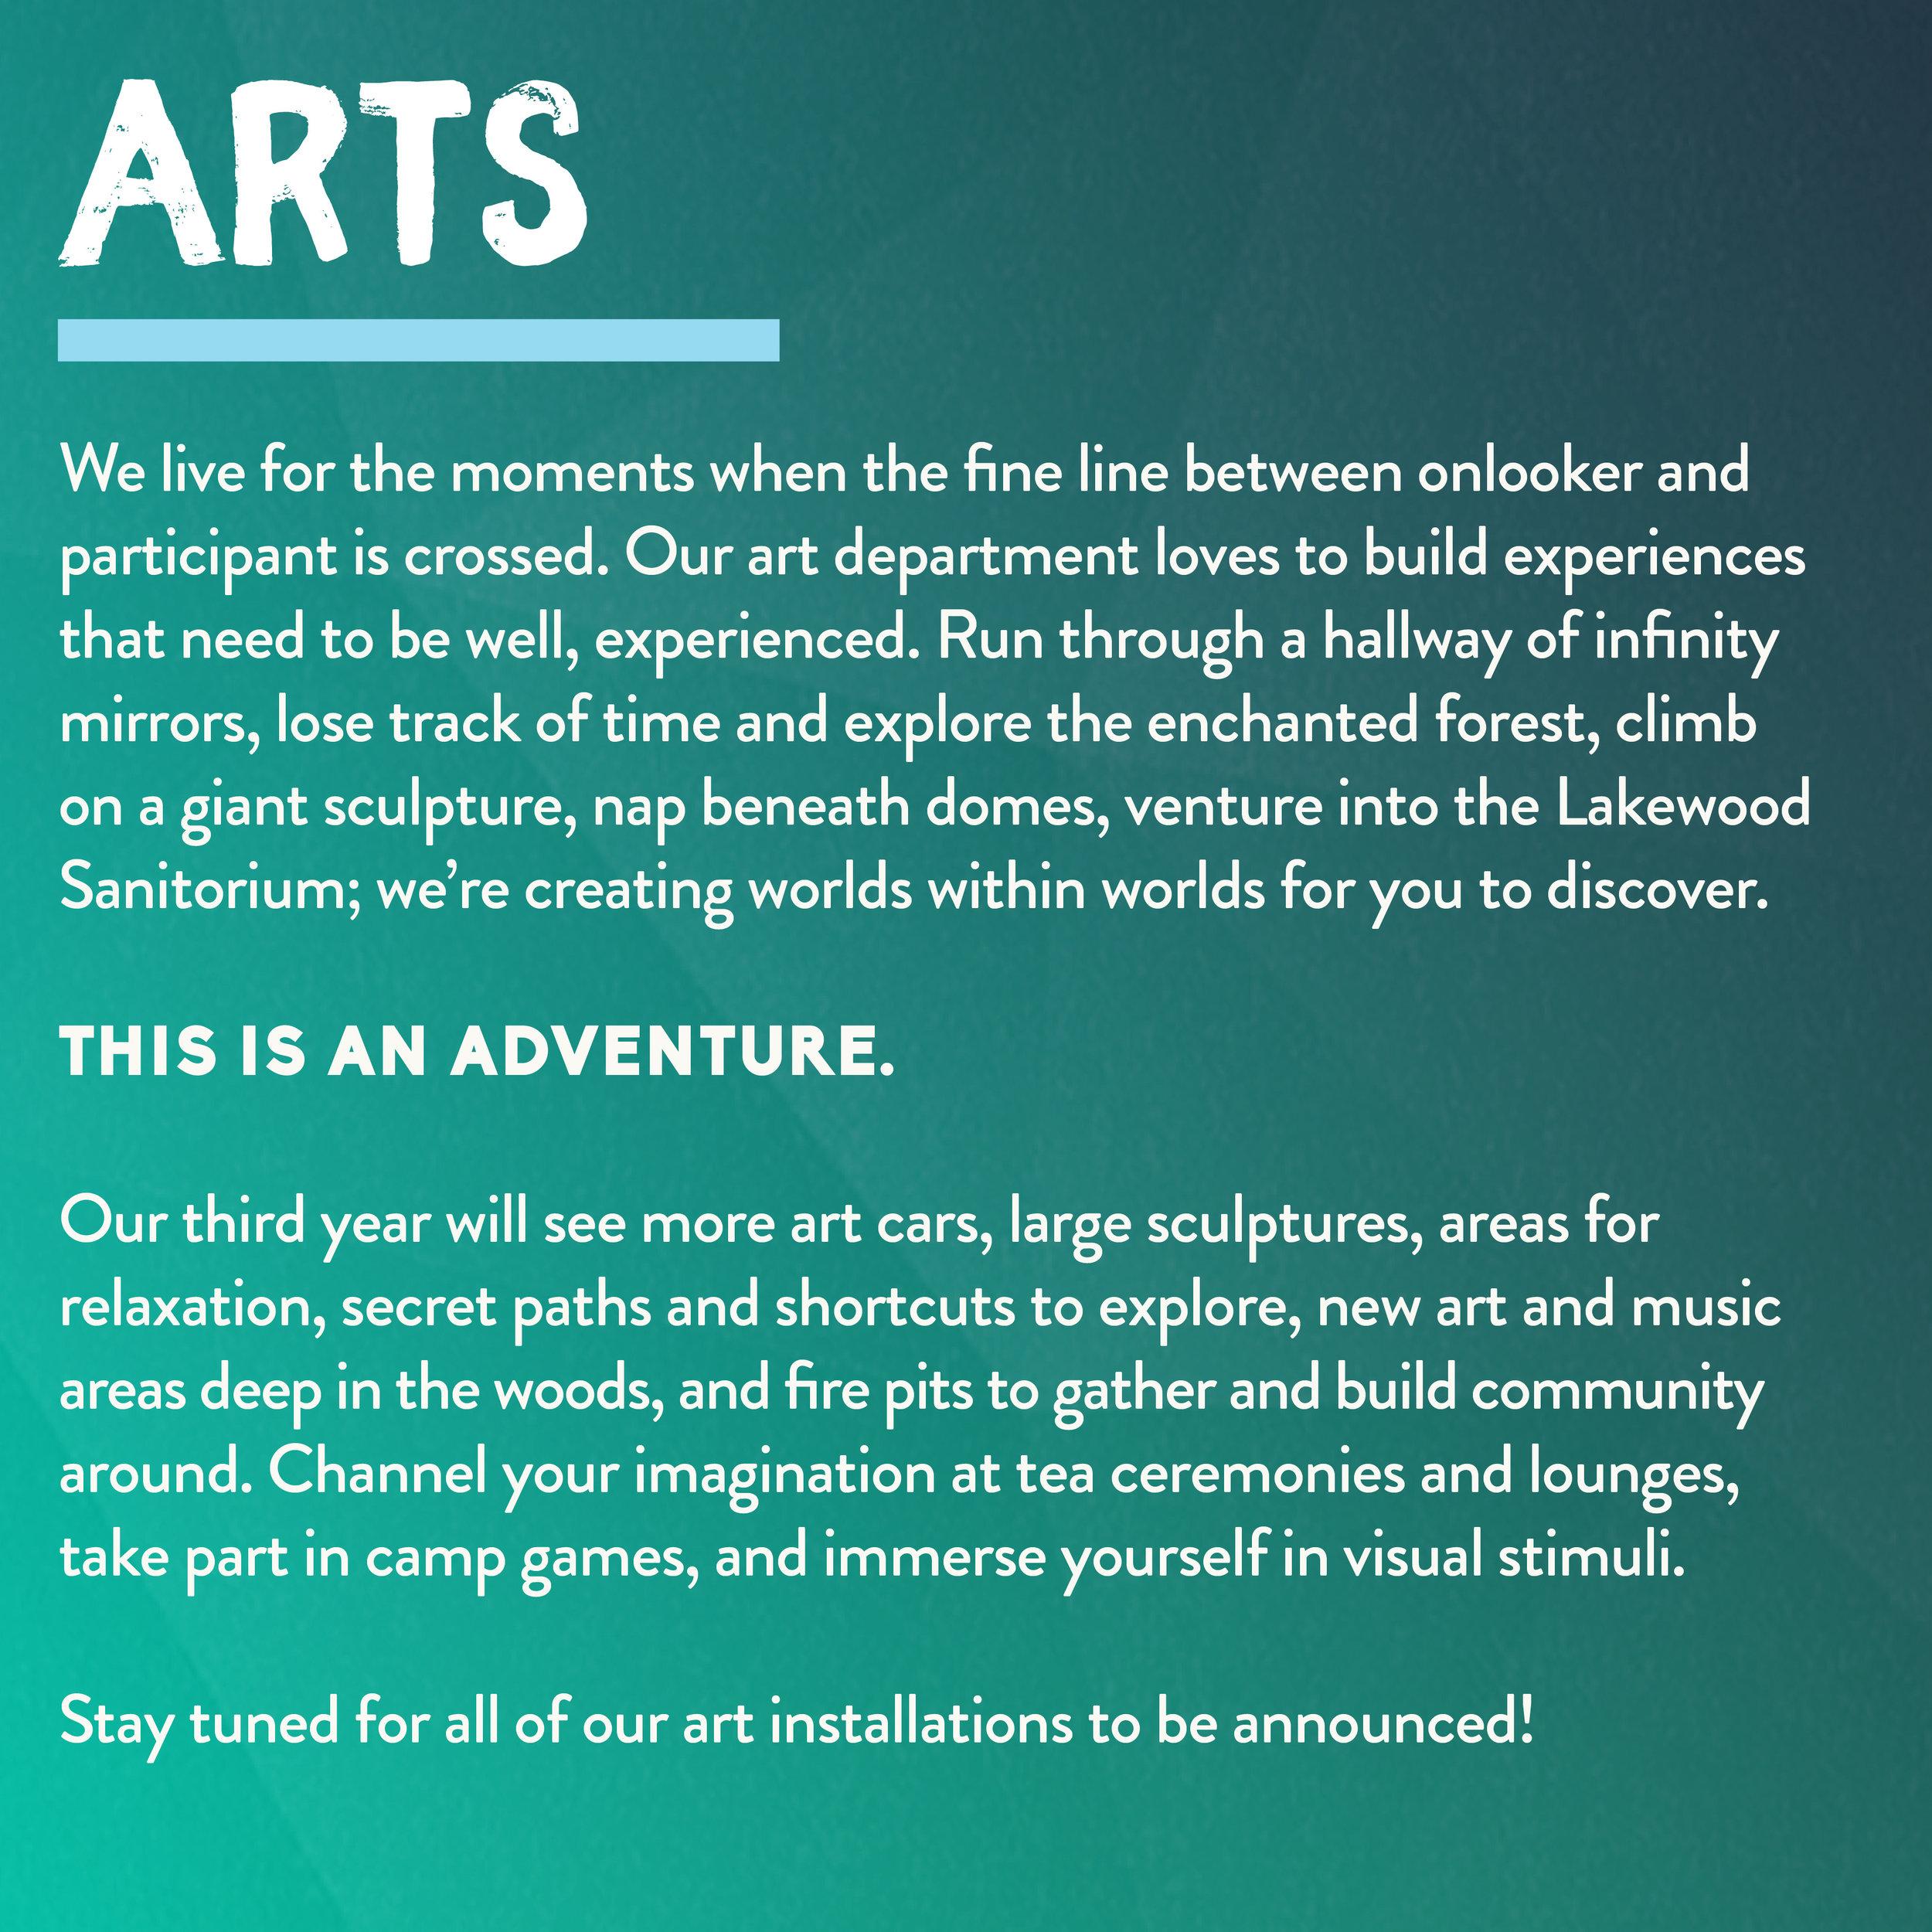 EXPERIENCE_Activities - 04.22.19 - arts.jpg